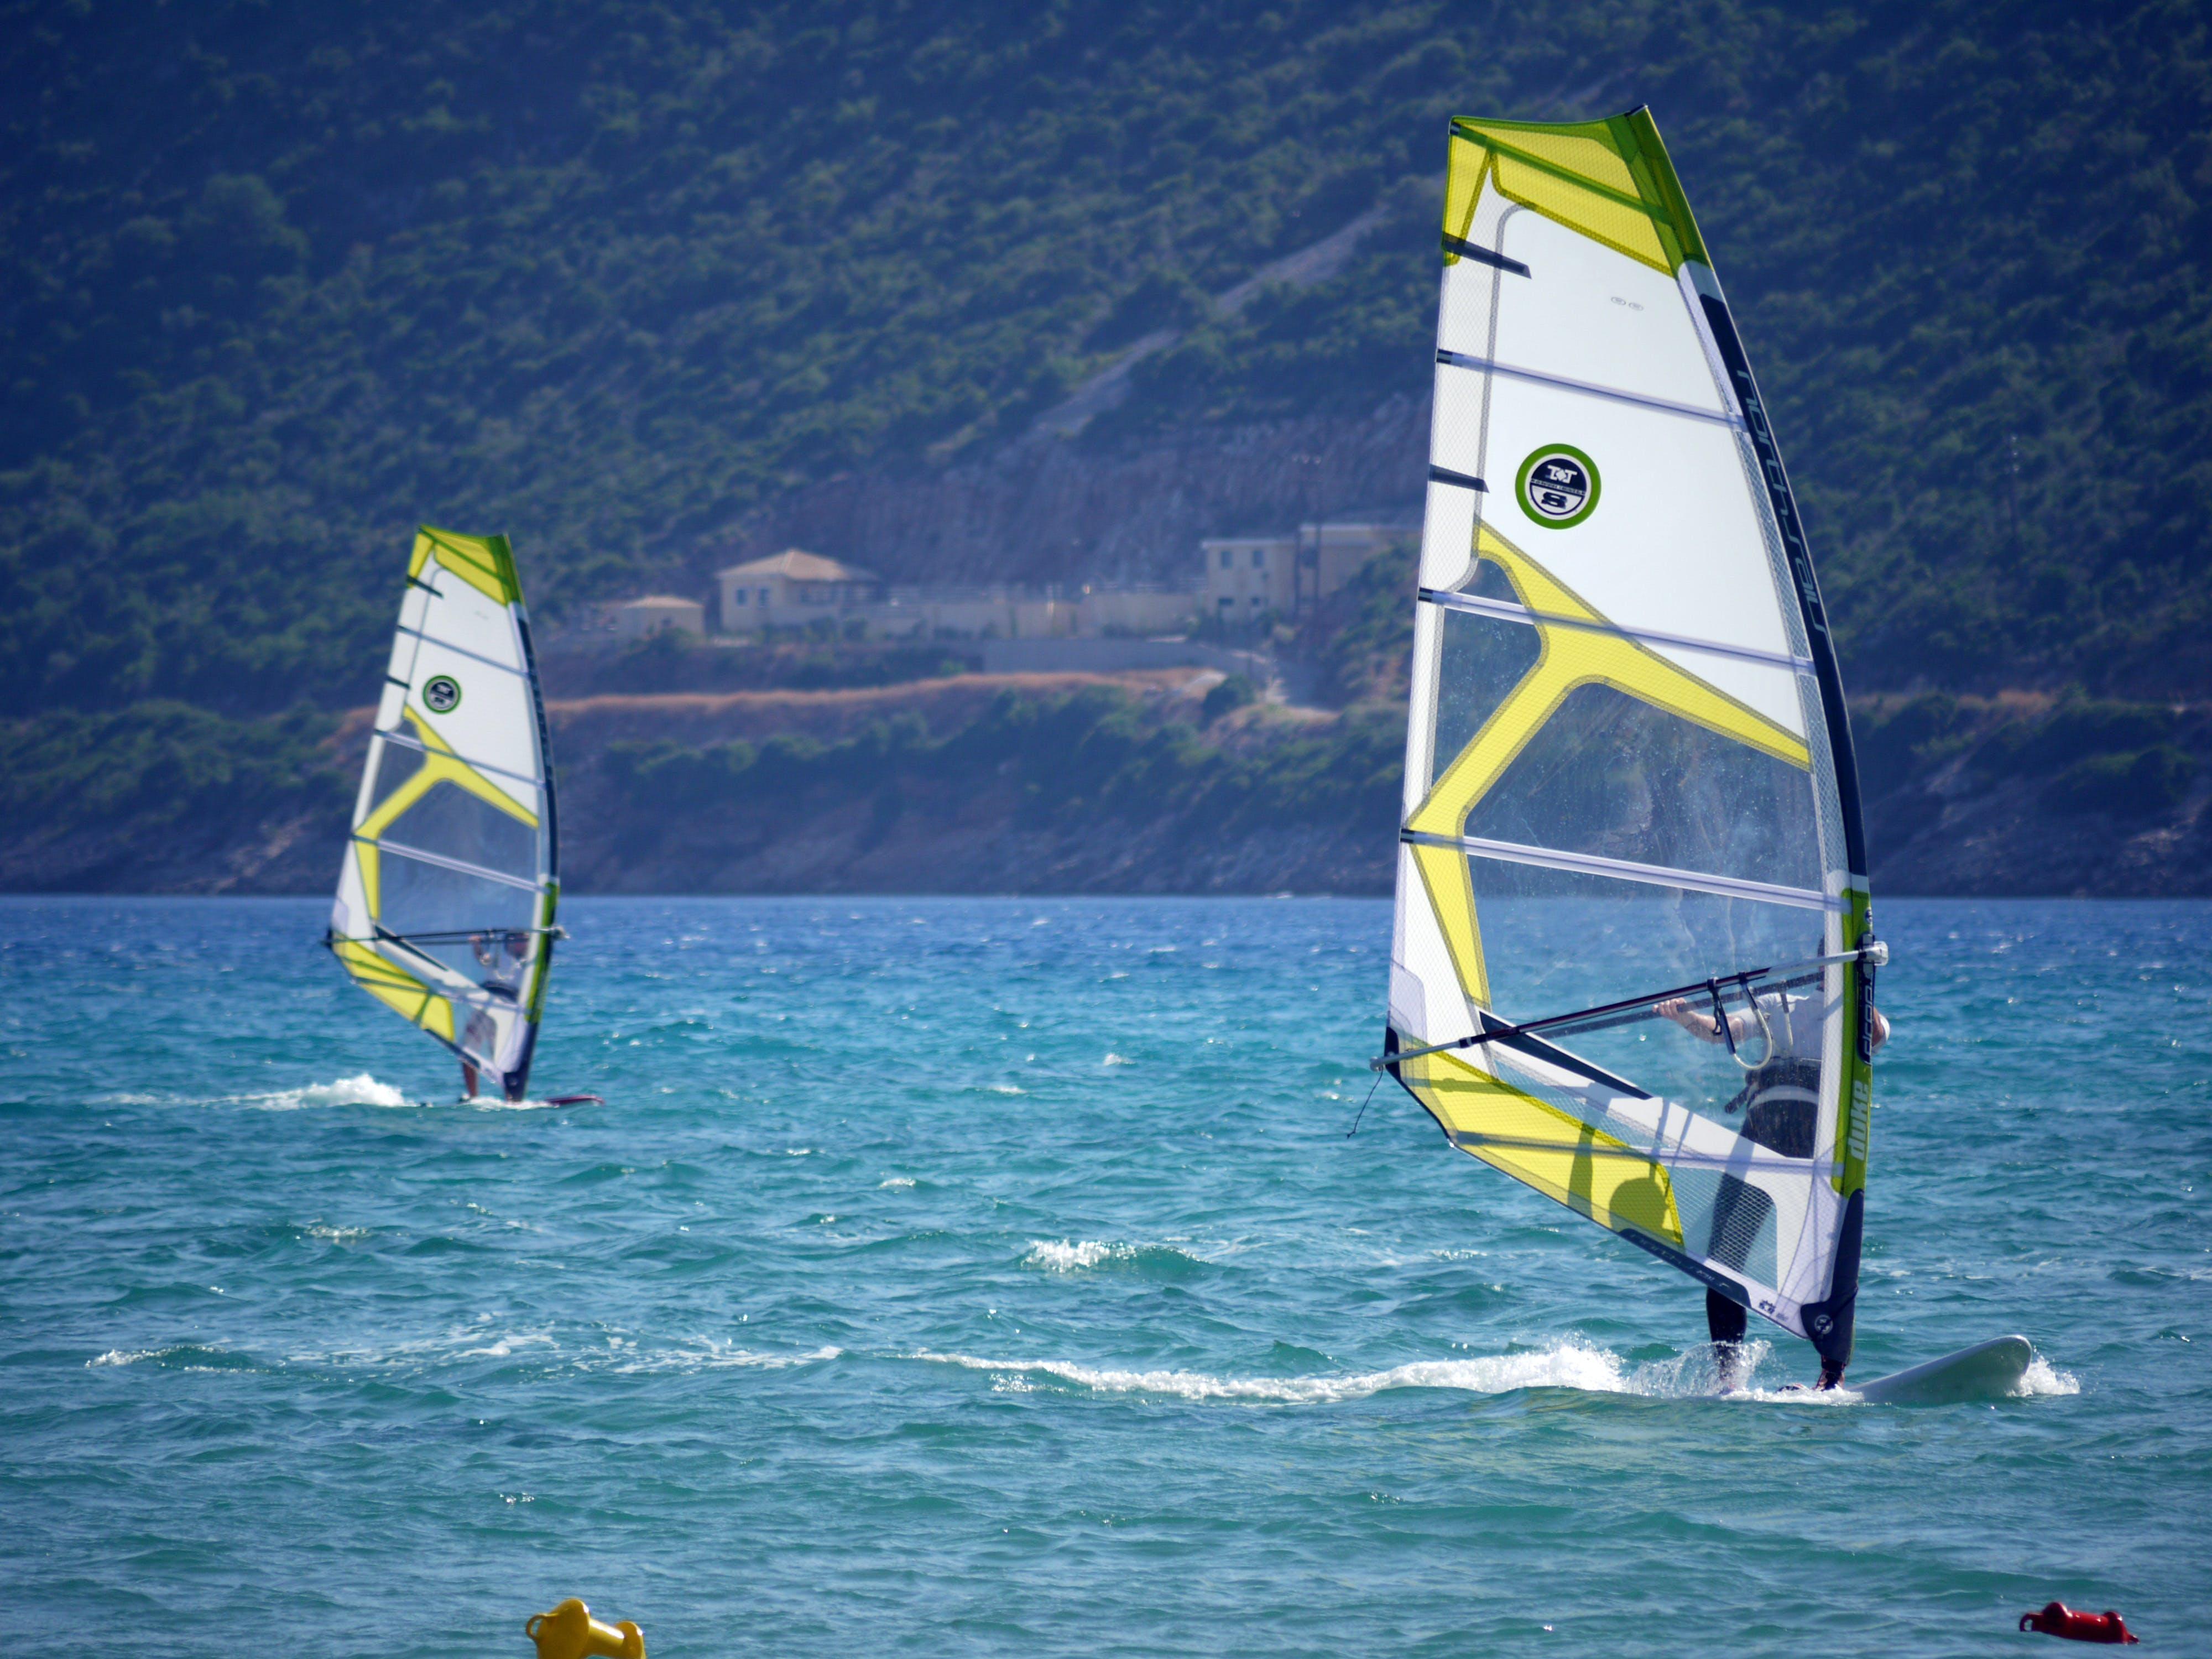 Free stock photo of sea, bay, sailing, windy